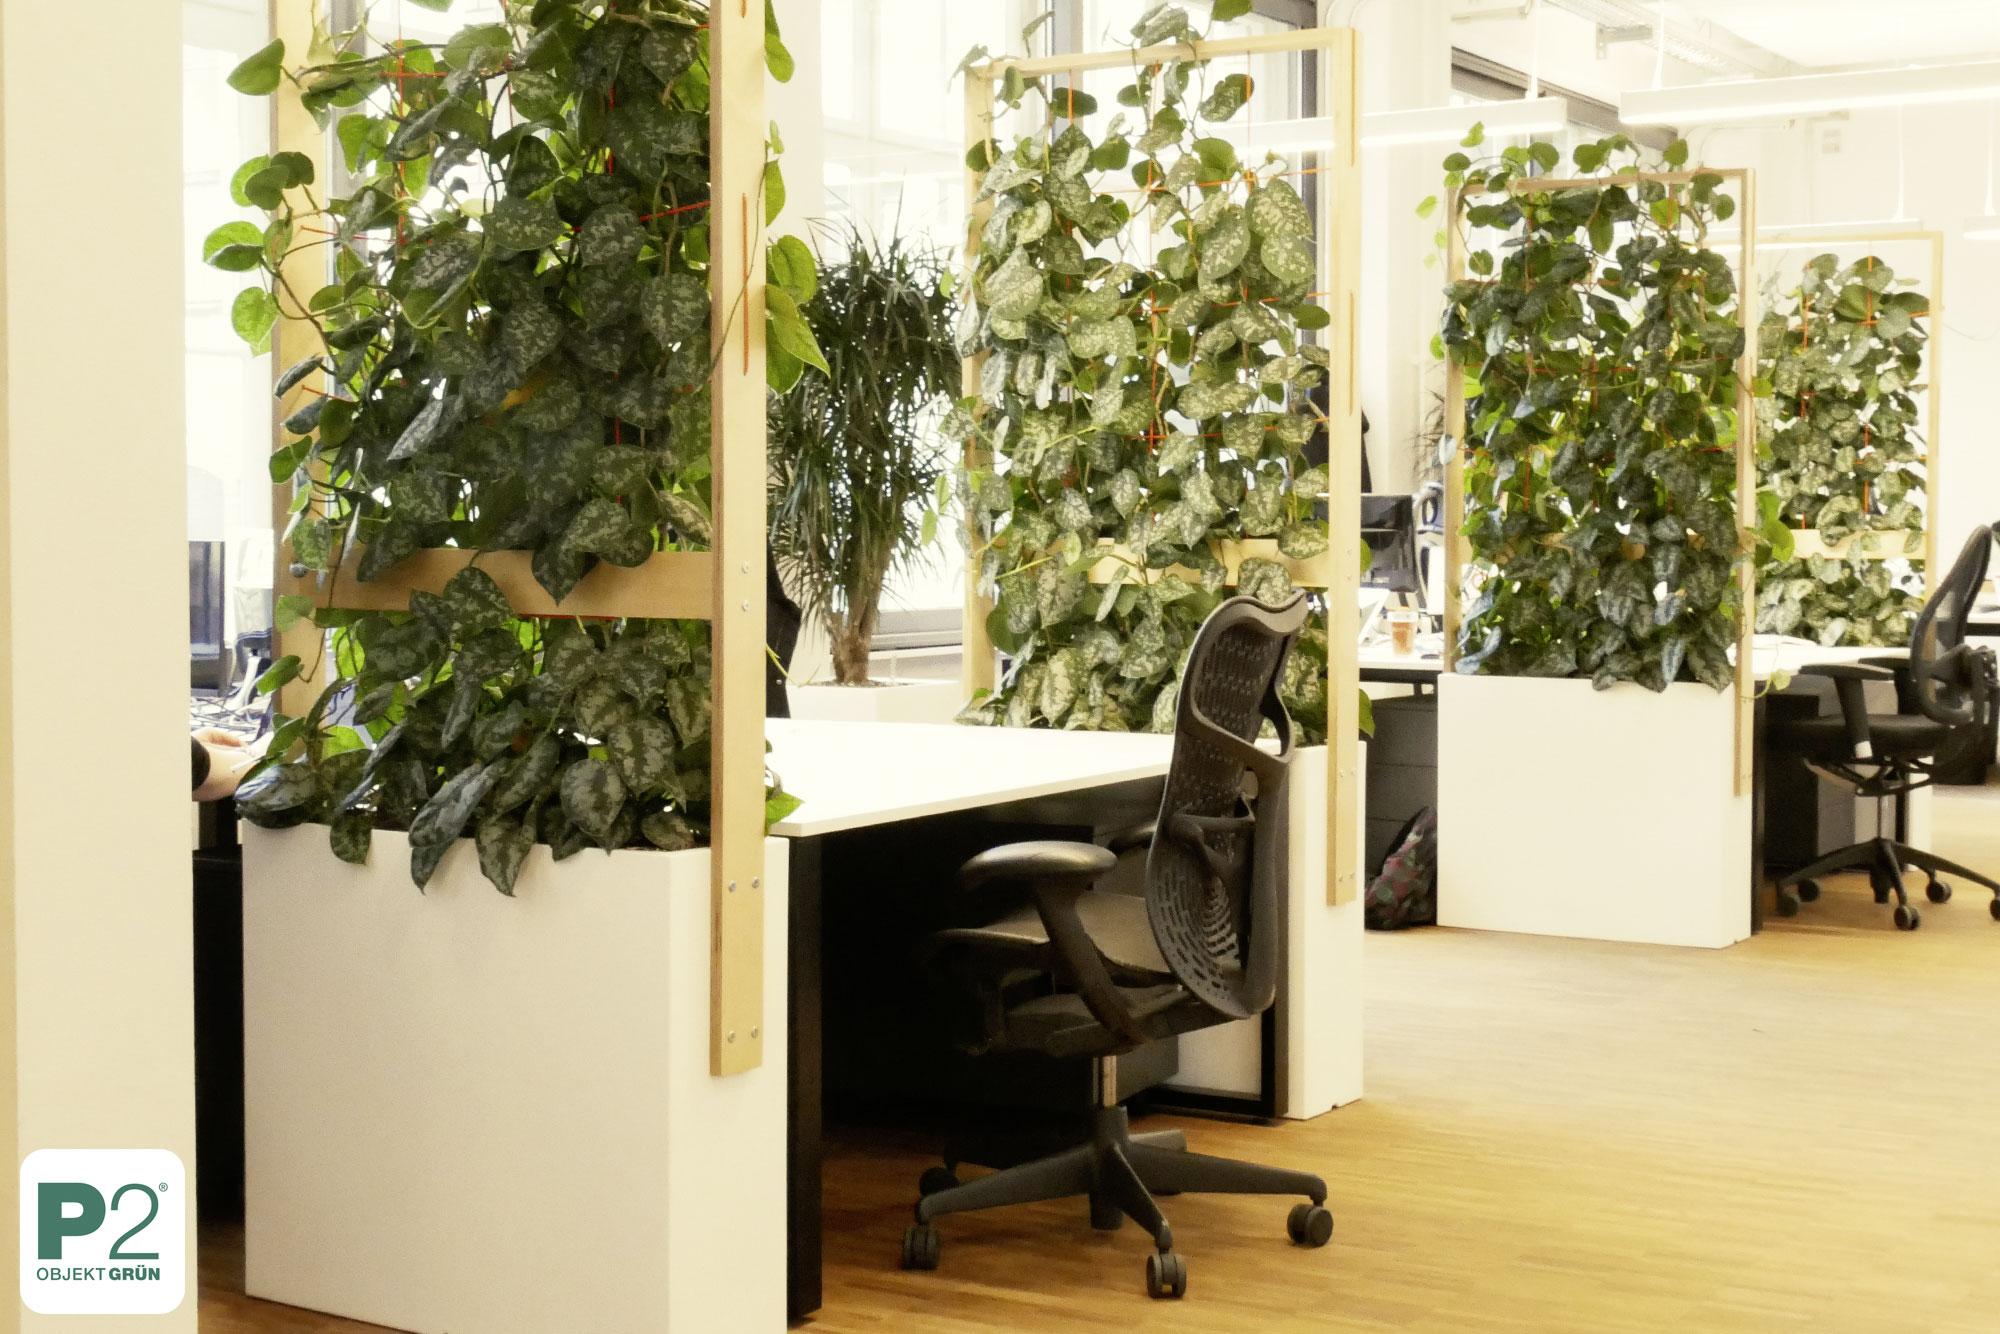 Arbeitsplatzschutz Corona, Teiler mit Pflanzen